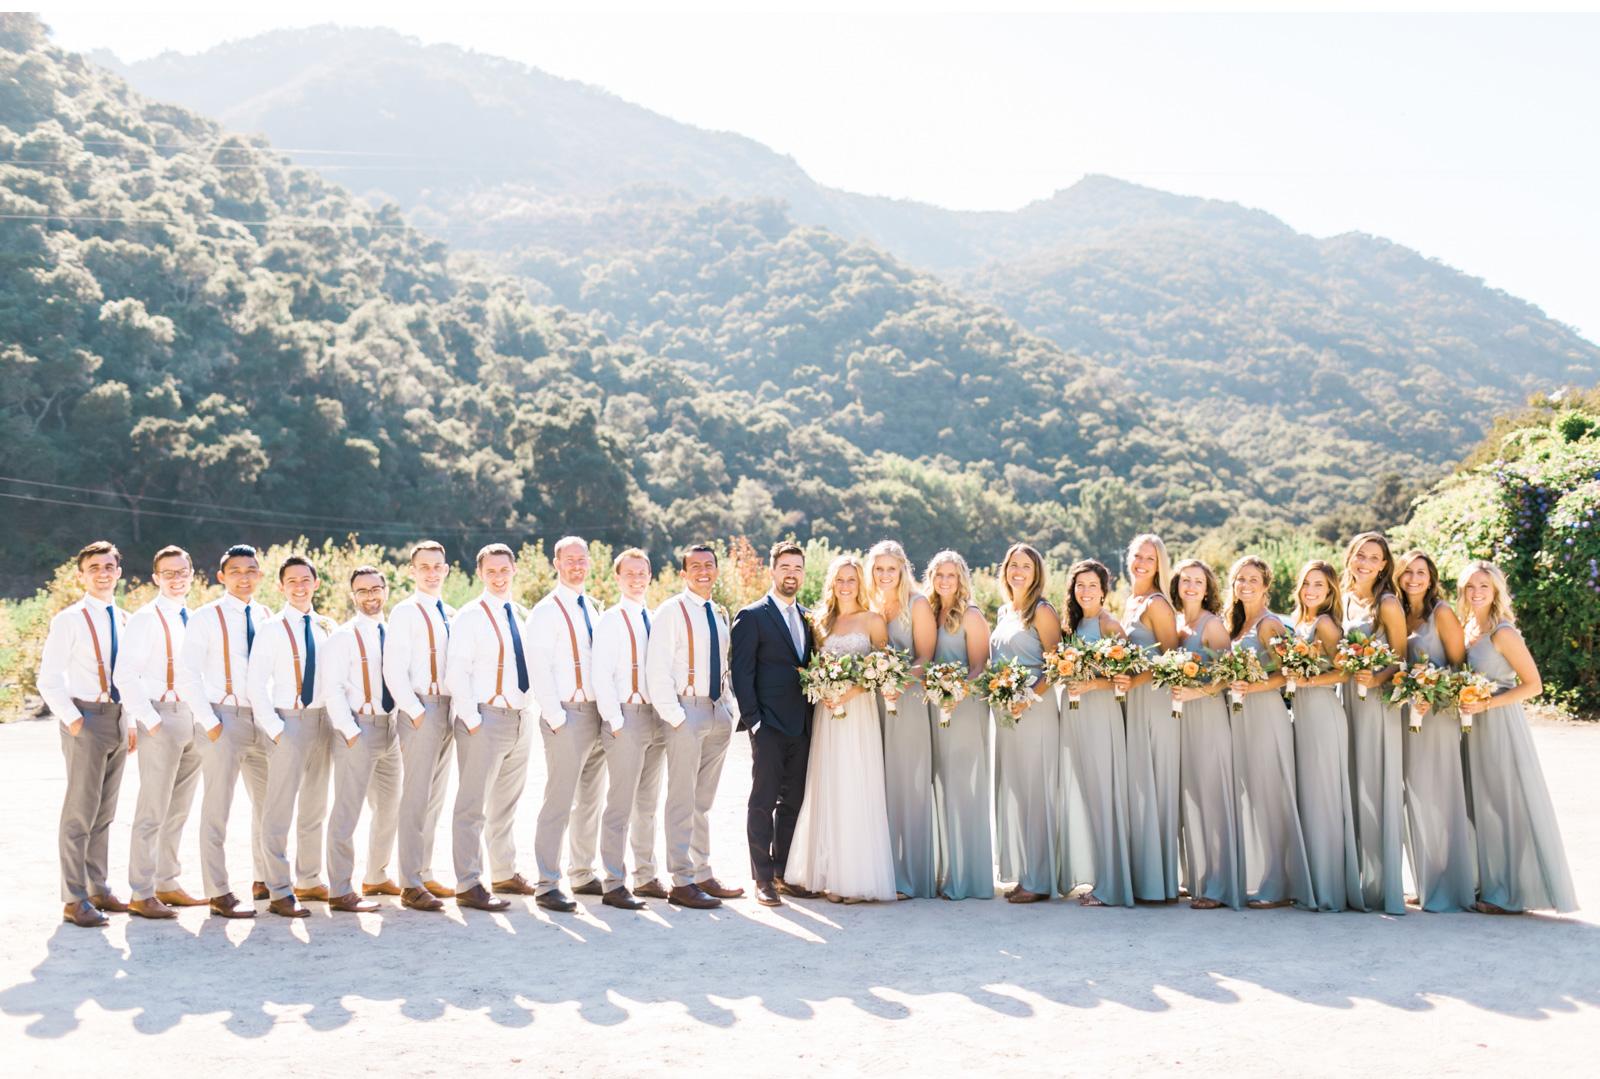 Sea-Canyon-Fruit-Ranch-Wedding-Natalie-Schutt-Photography_01.jpg